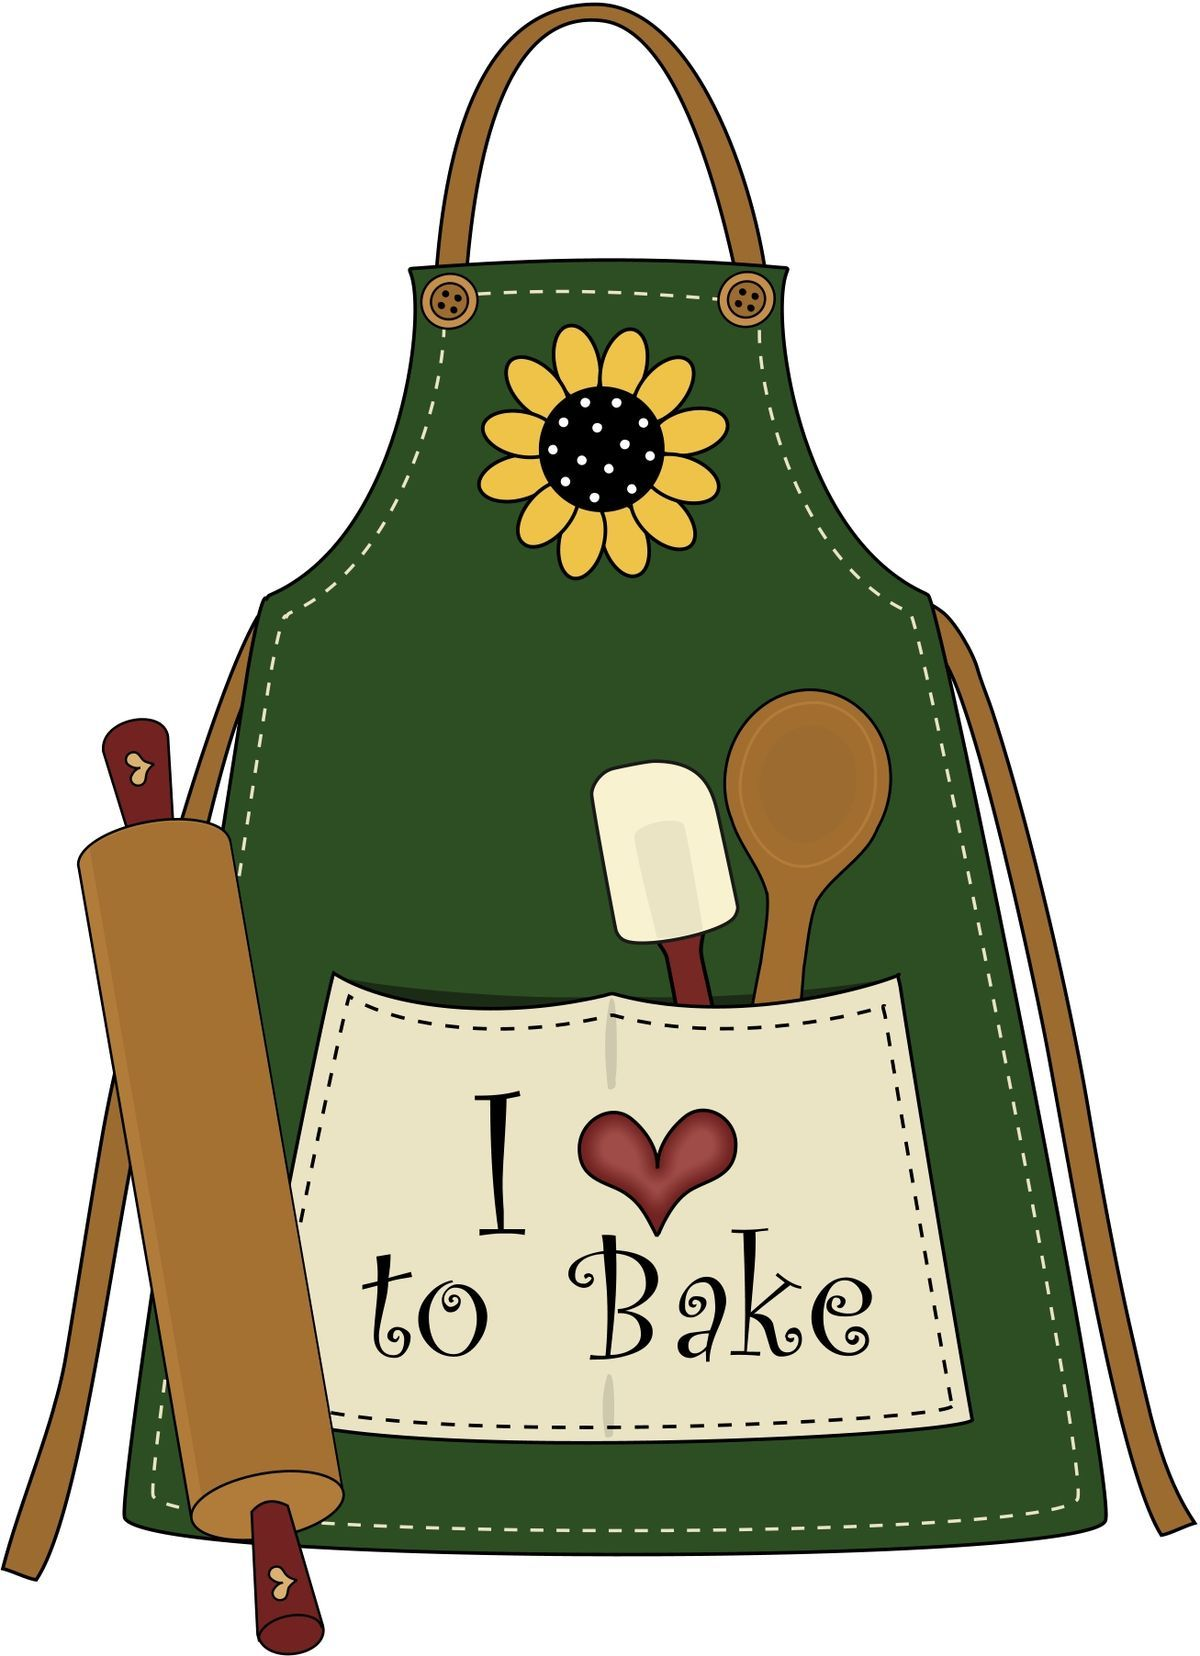 Cookbook Clipart : cookbook, clipart, 5f90c37d2089adc9c90df82c6a481dcb.jpg, 1,200×1,656, Píxeles, Recipe, Cookbook,, Cookbook, Design